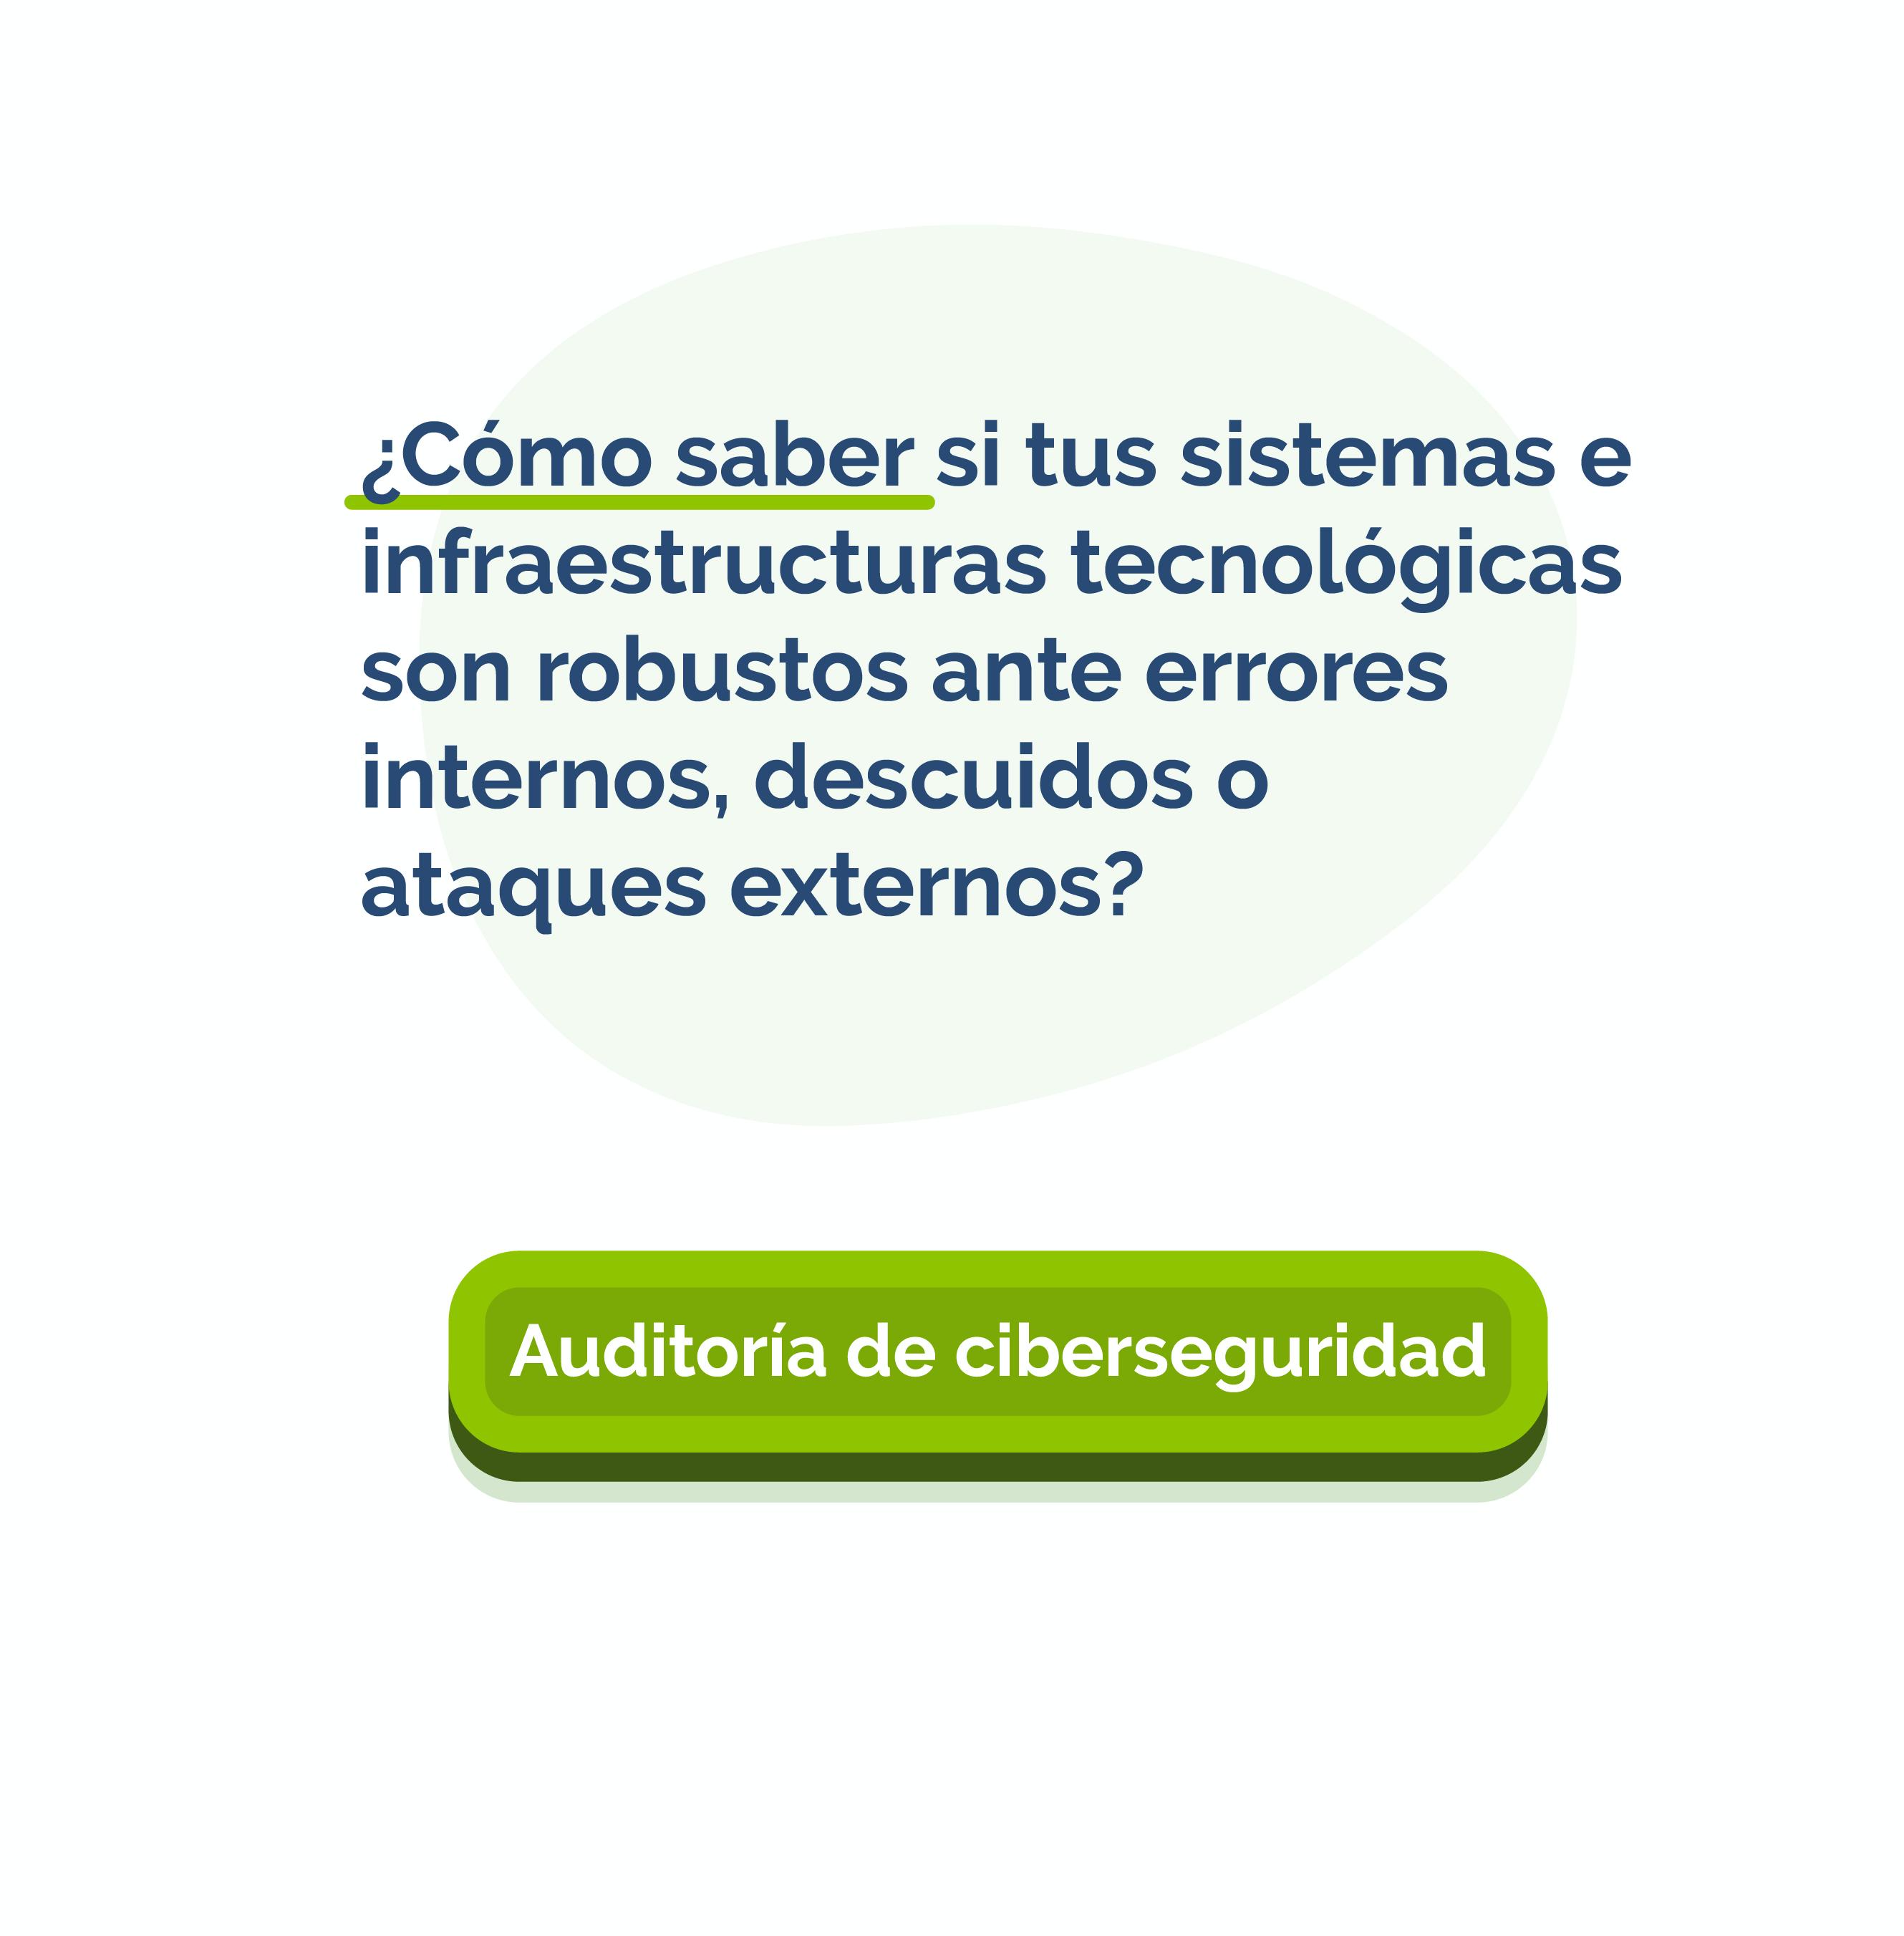 auditoria ciberseguridad